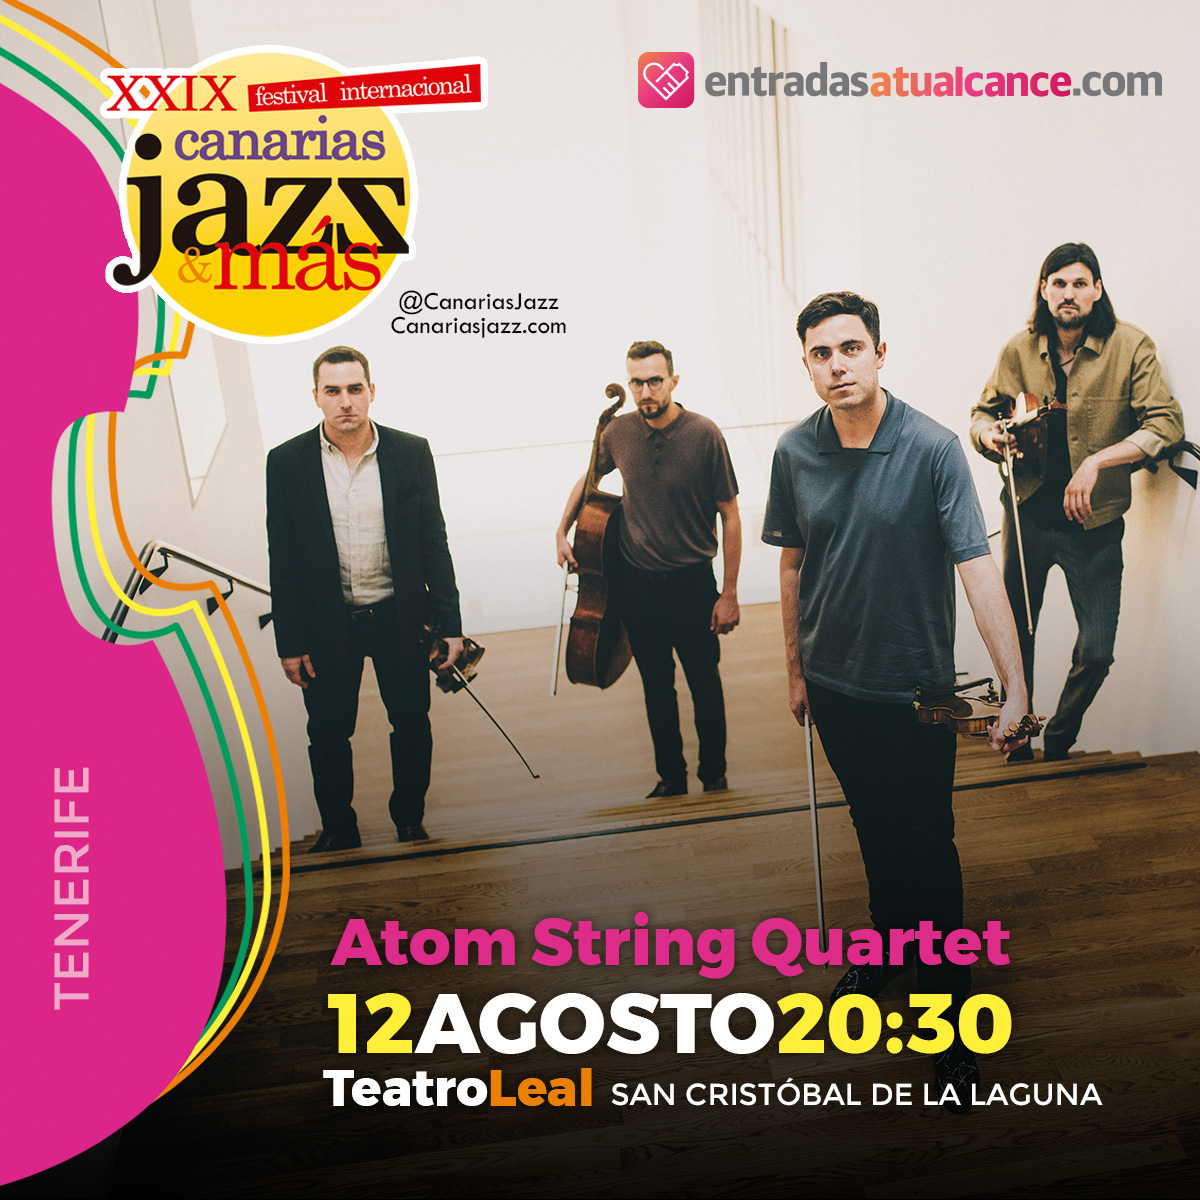 xxix-festival-internacional-canarias-jazz-and-mas-atom-string-qu-5f0d706be3373.jpeg